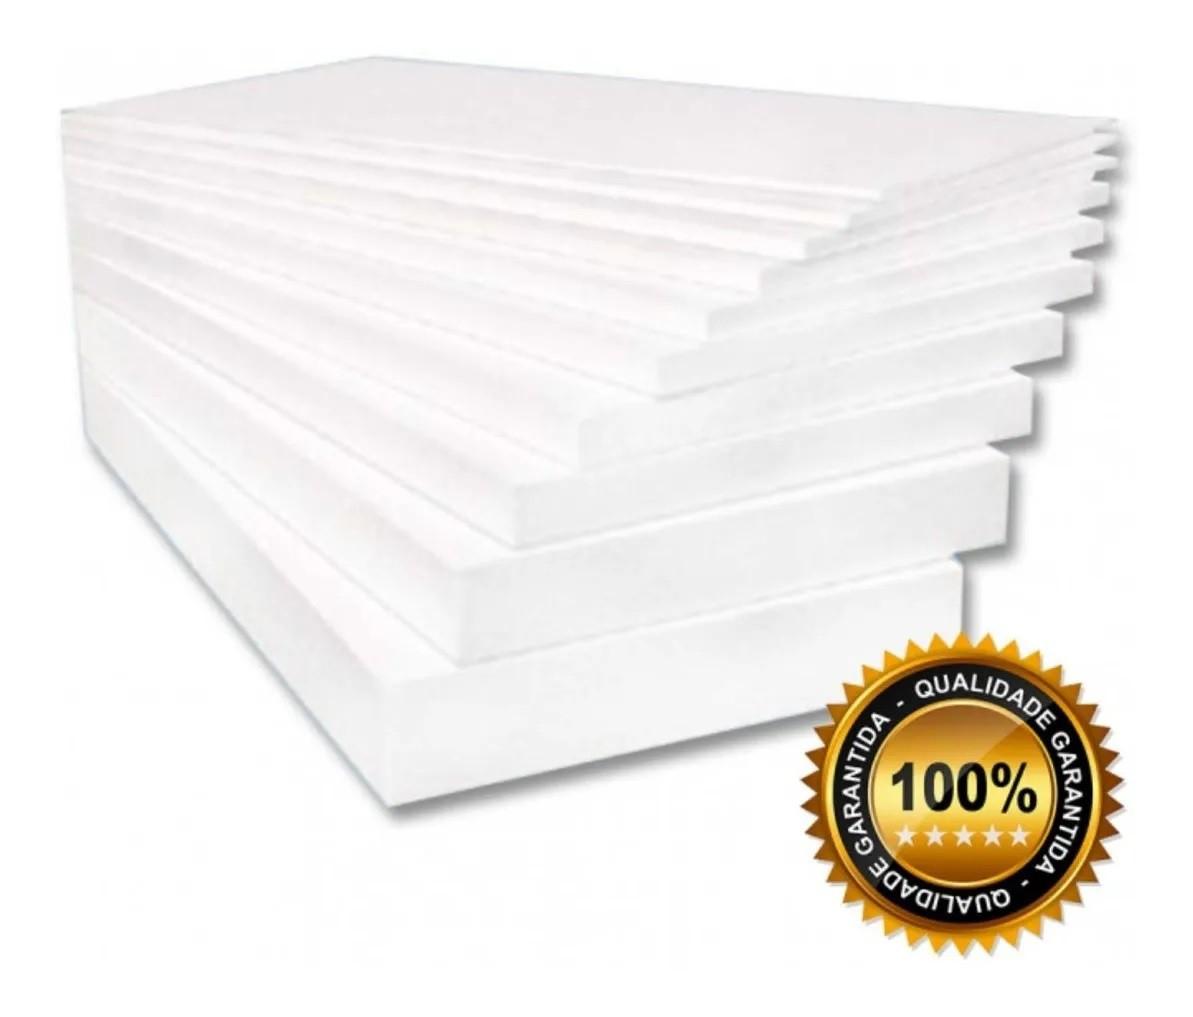 Placa De Isopor Espessura 3cm 100x50cm